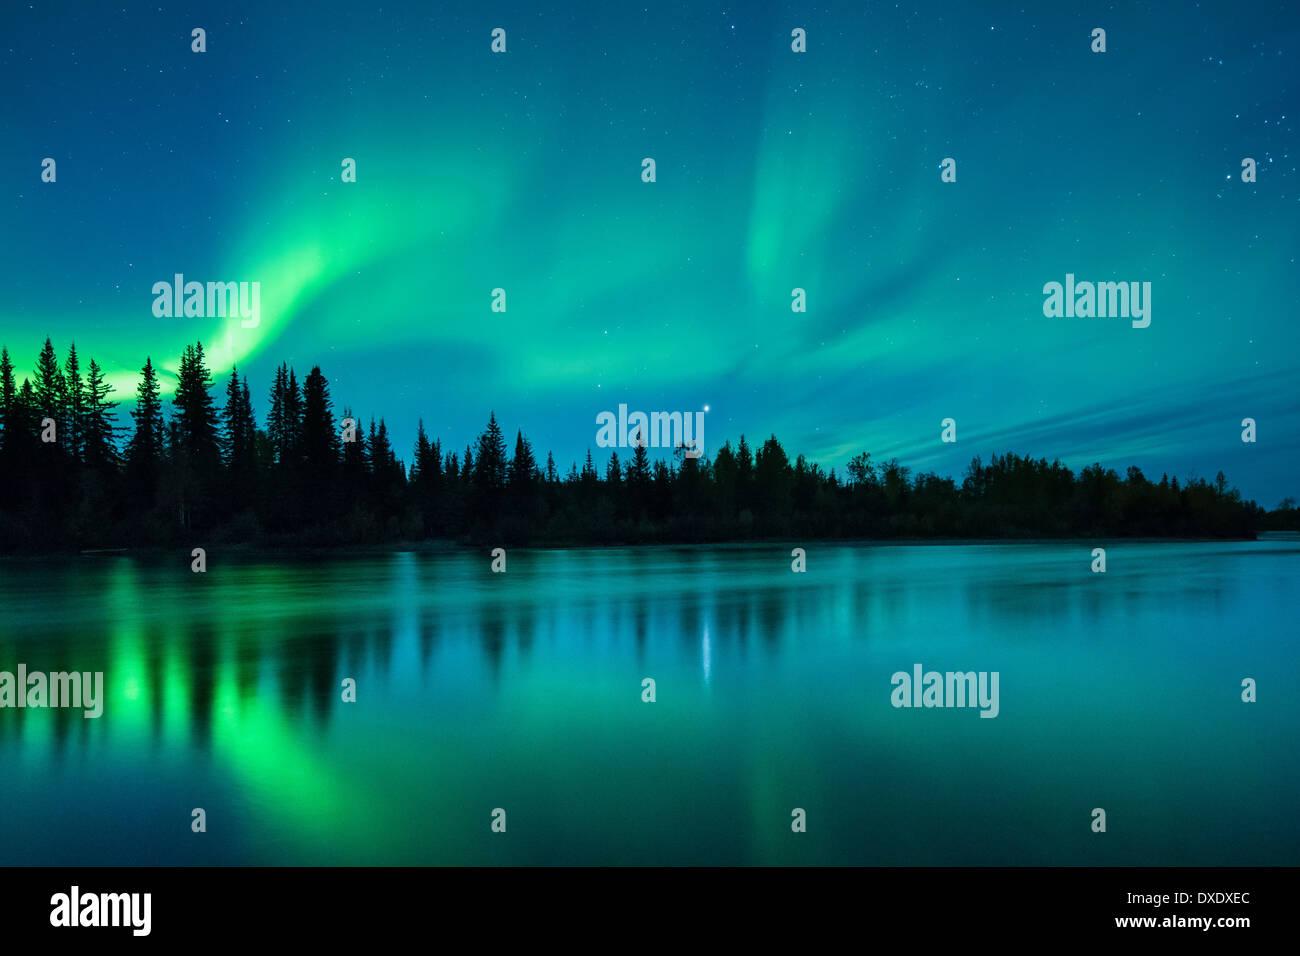 The Aurora Borealis (Northern Lights) over the Klondike River, Yukon Territories, Canada - Stock Image